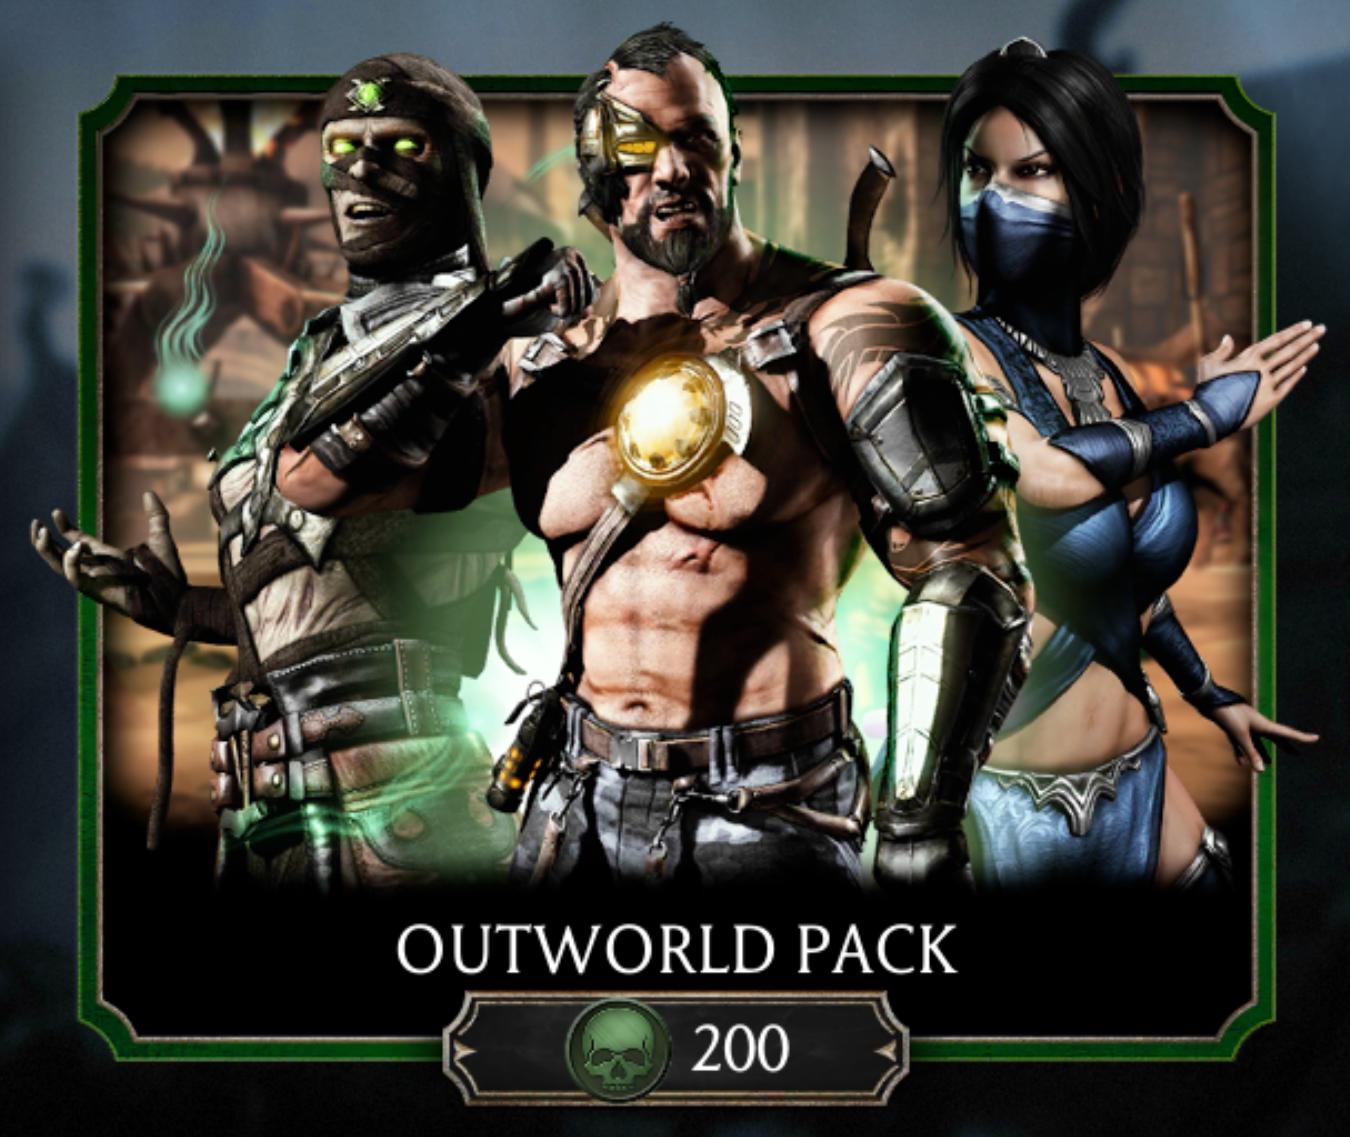 Outworld Pack | Mortal Kombat Mobile Wikia | FANDOM powered